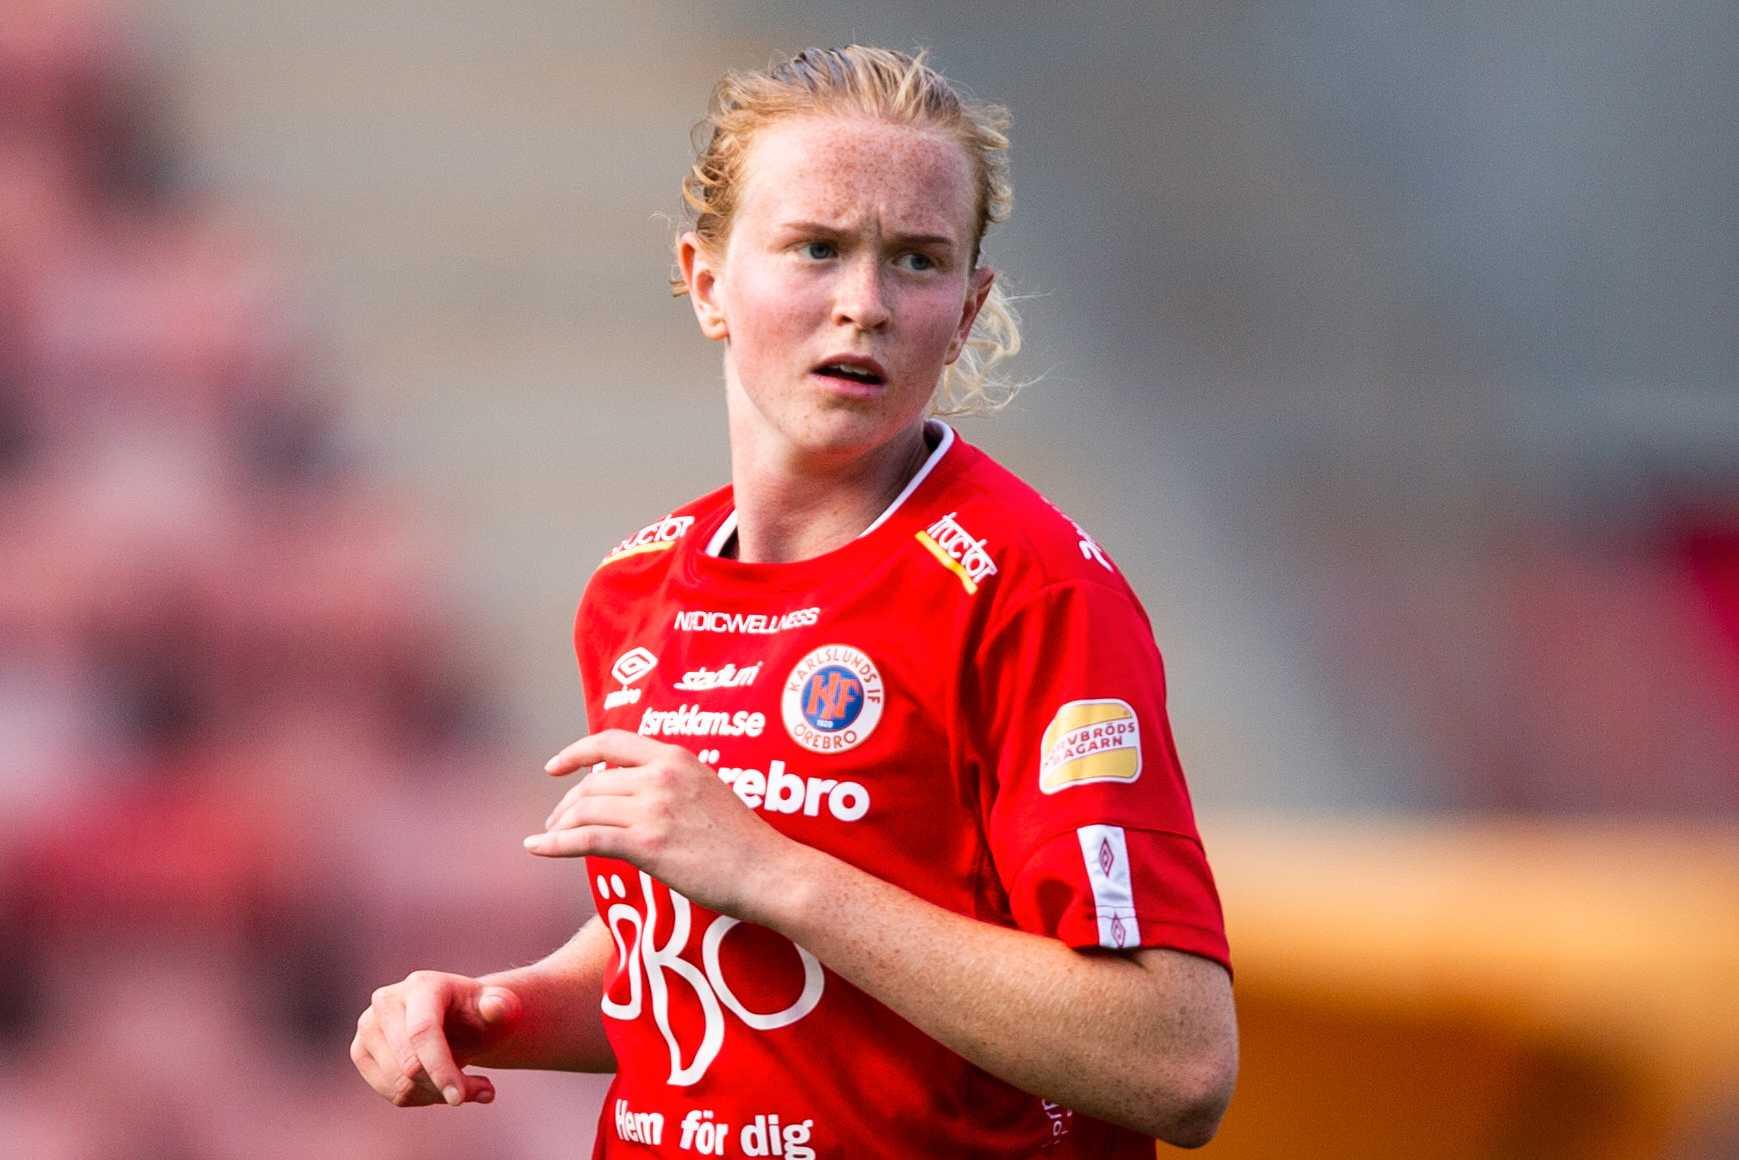 Kif Örebros Emma Östlund. Arkivbild.